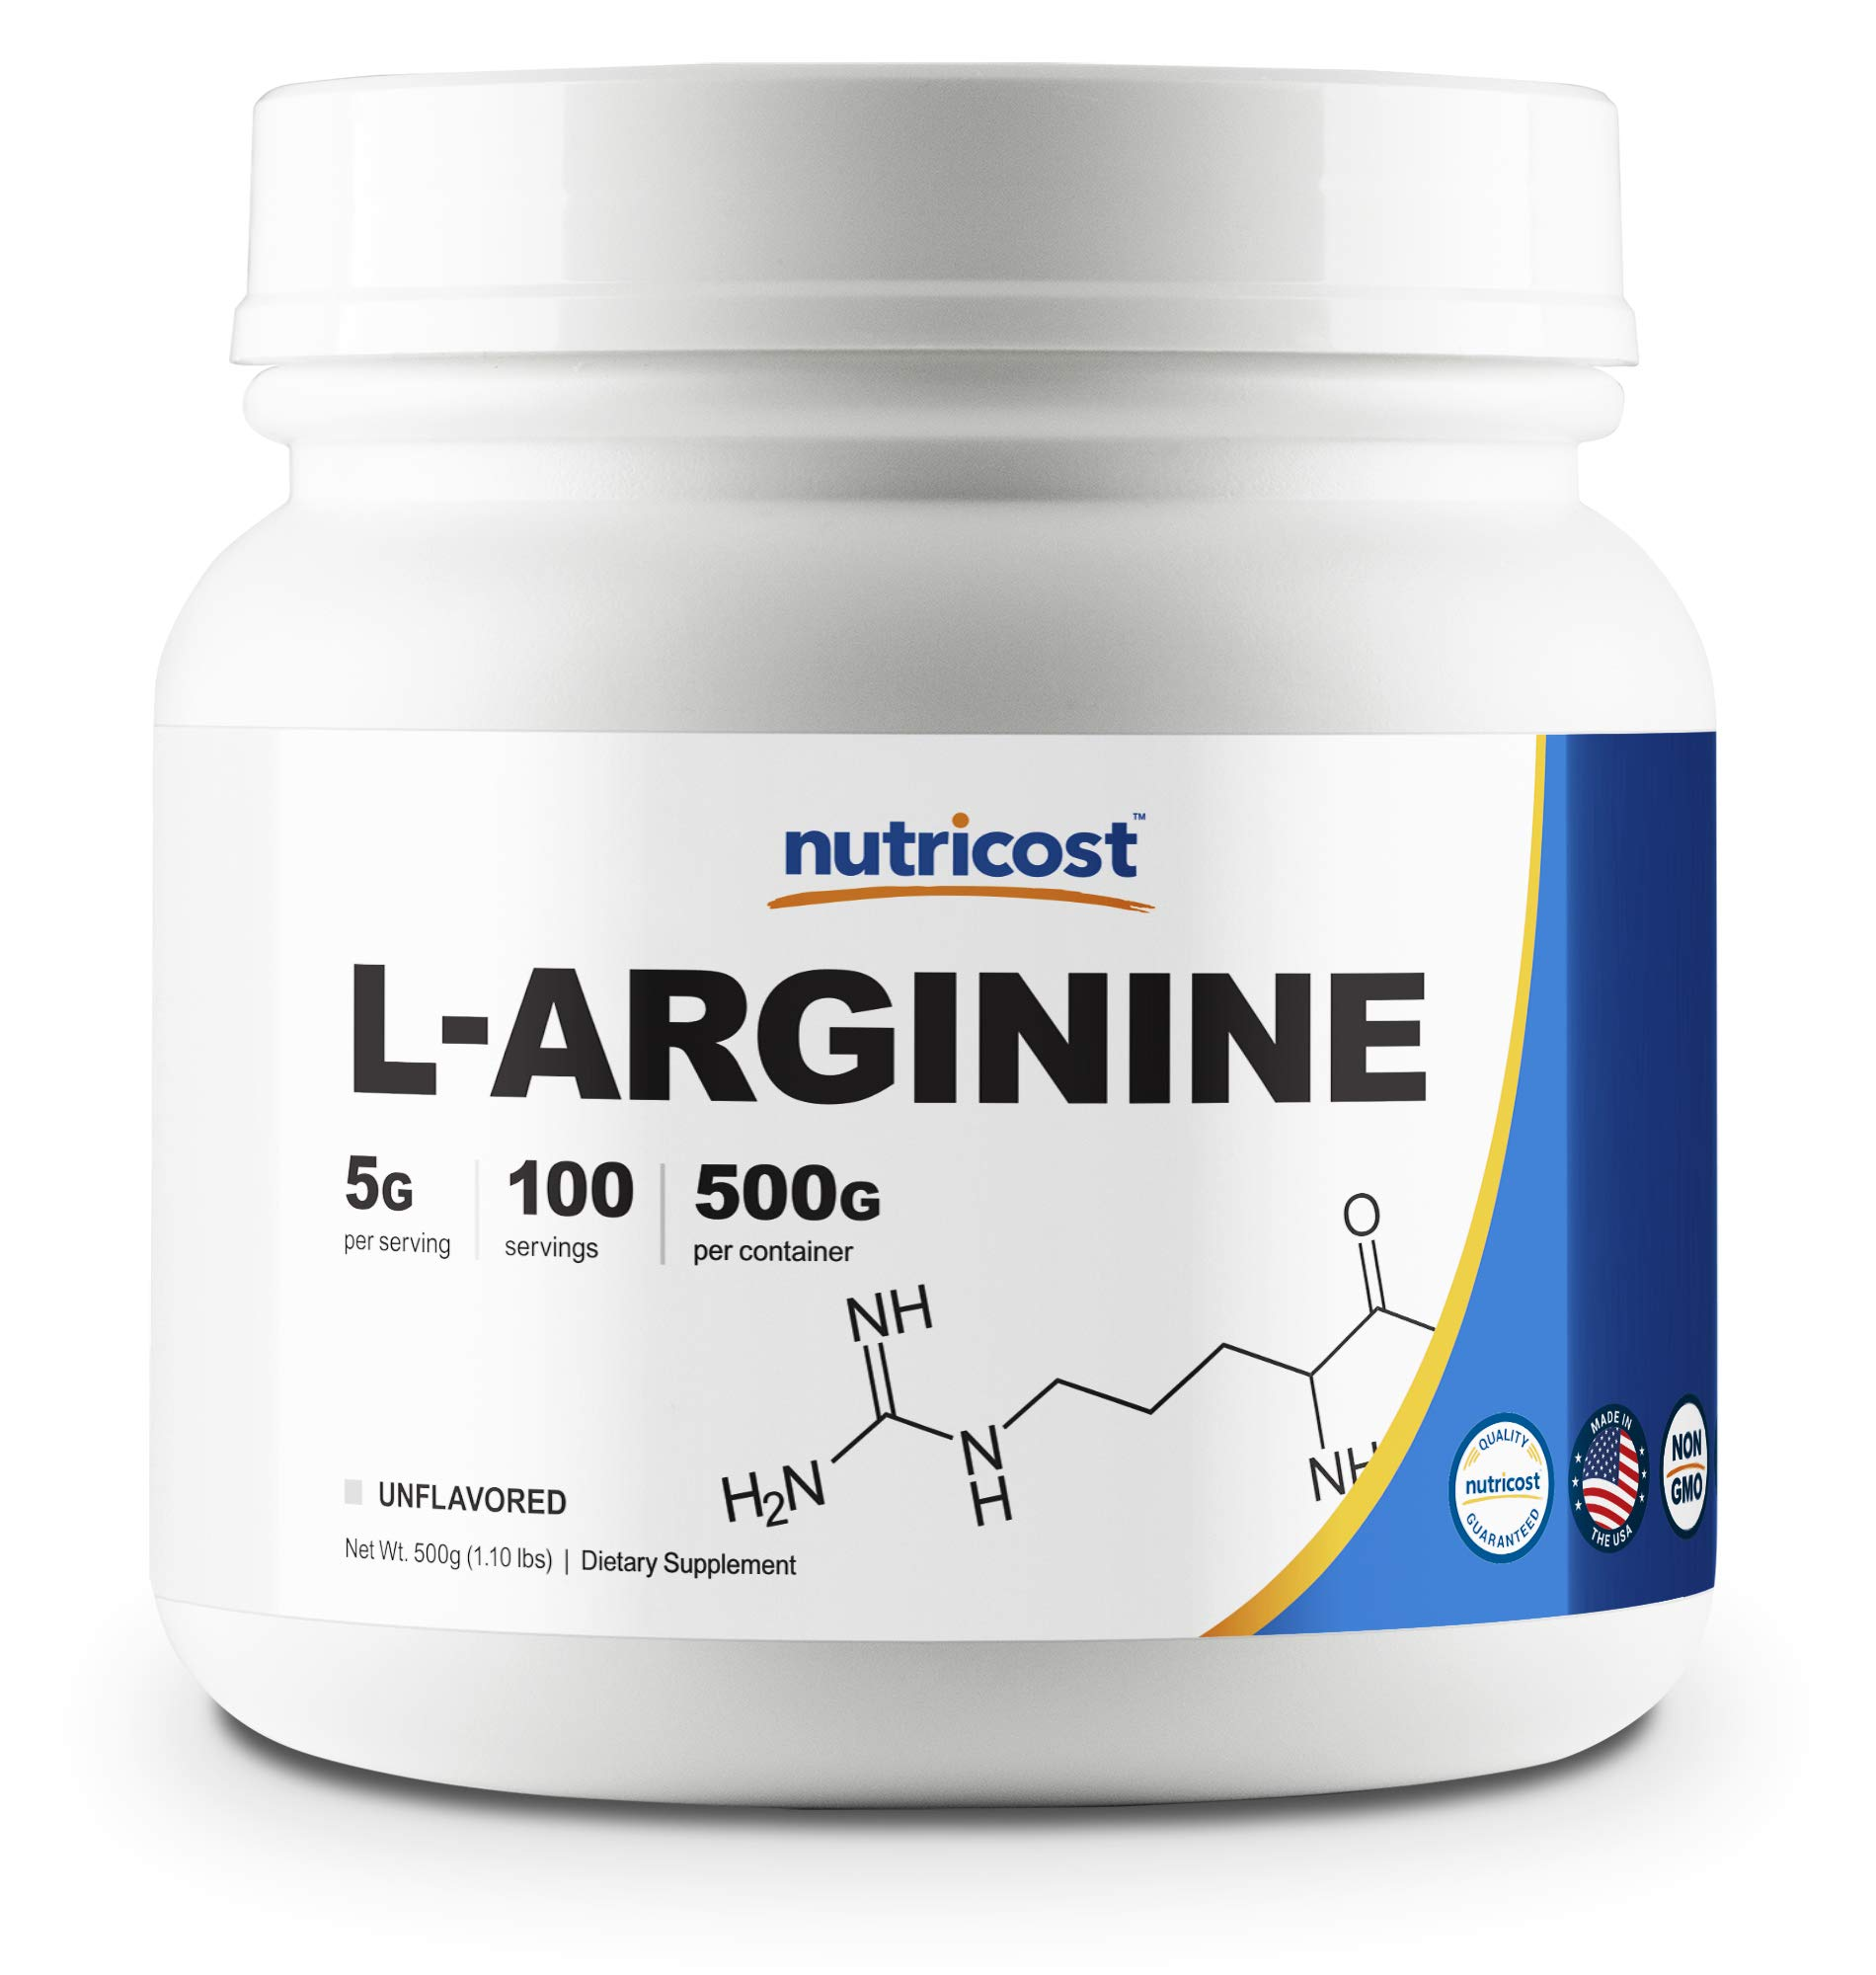 Nutricost L-Arginine Powder 500 Grams (1.1lbs) - Pure L-Arginine Powder - 5000mg Per Serving; 100 Servings by Nutricost